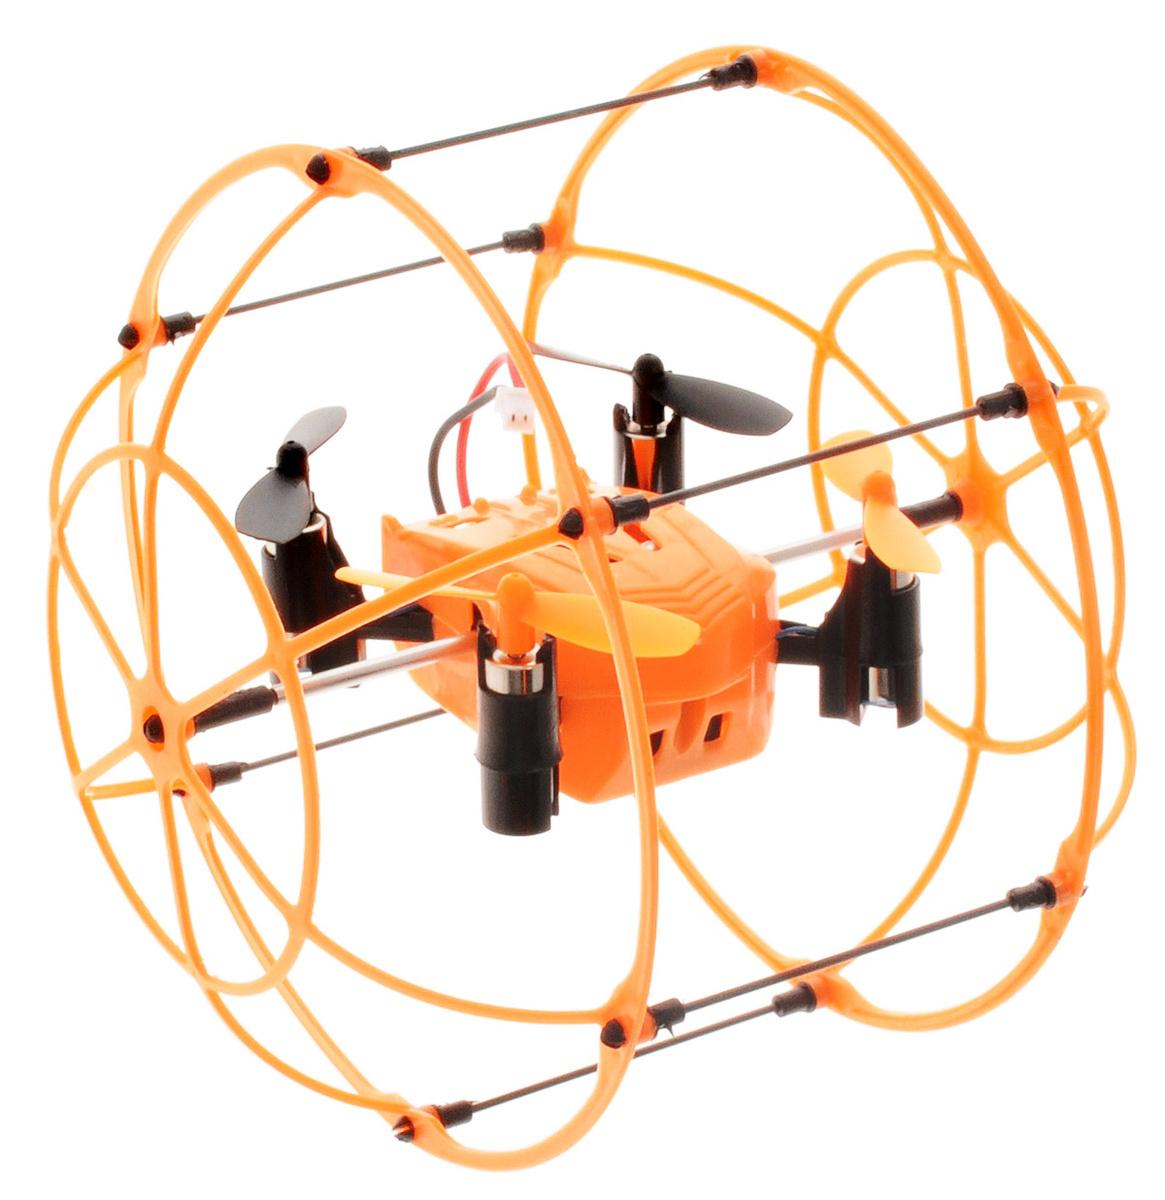 От винта! Квадрокоптер на радиоуправлении Fly-0246 #1